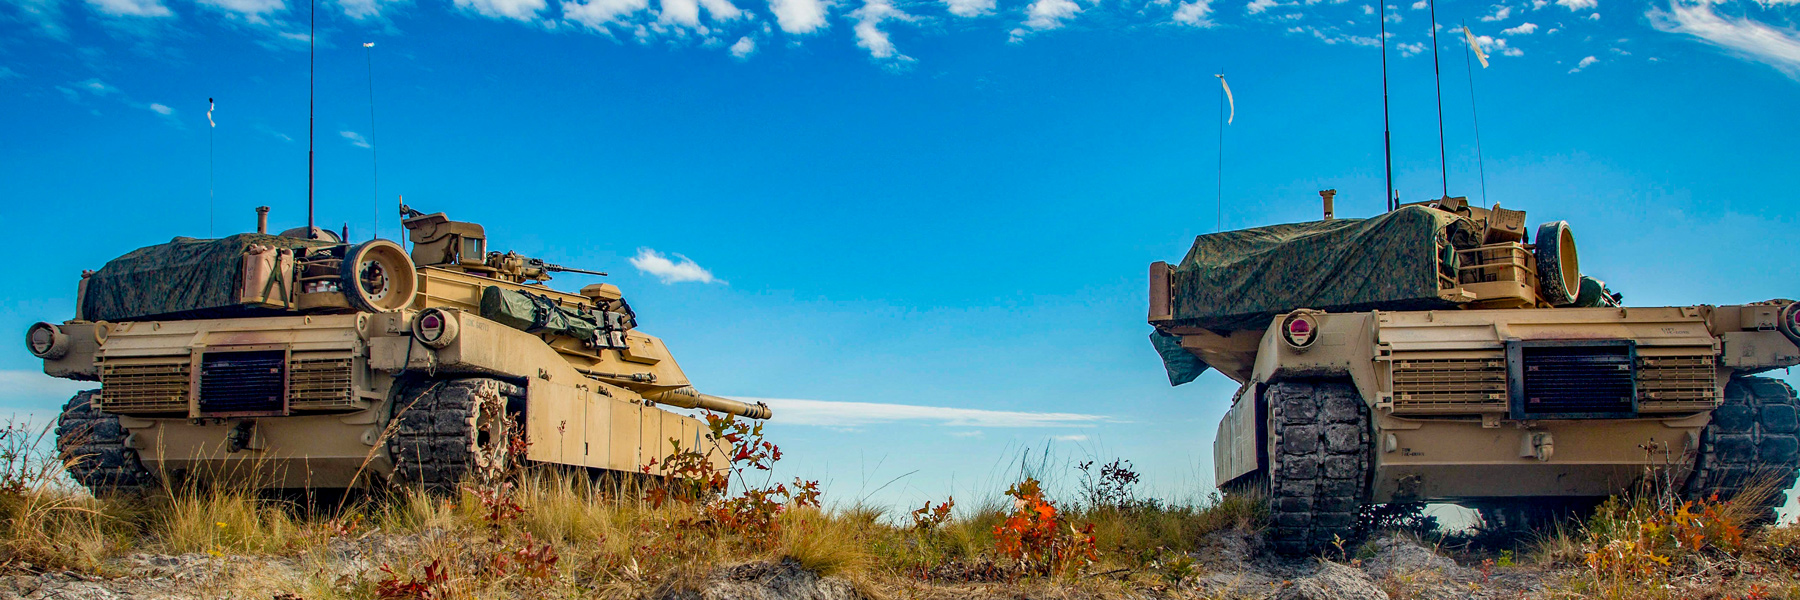 Ground Image - Tanks on hill